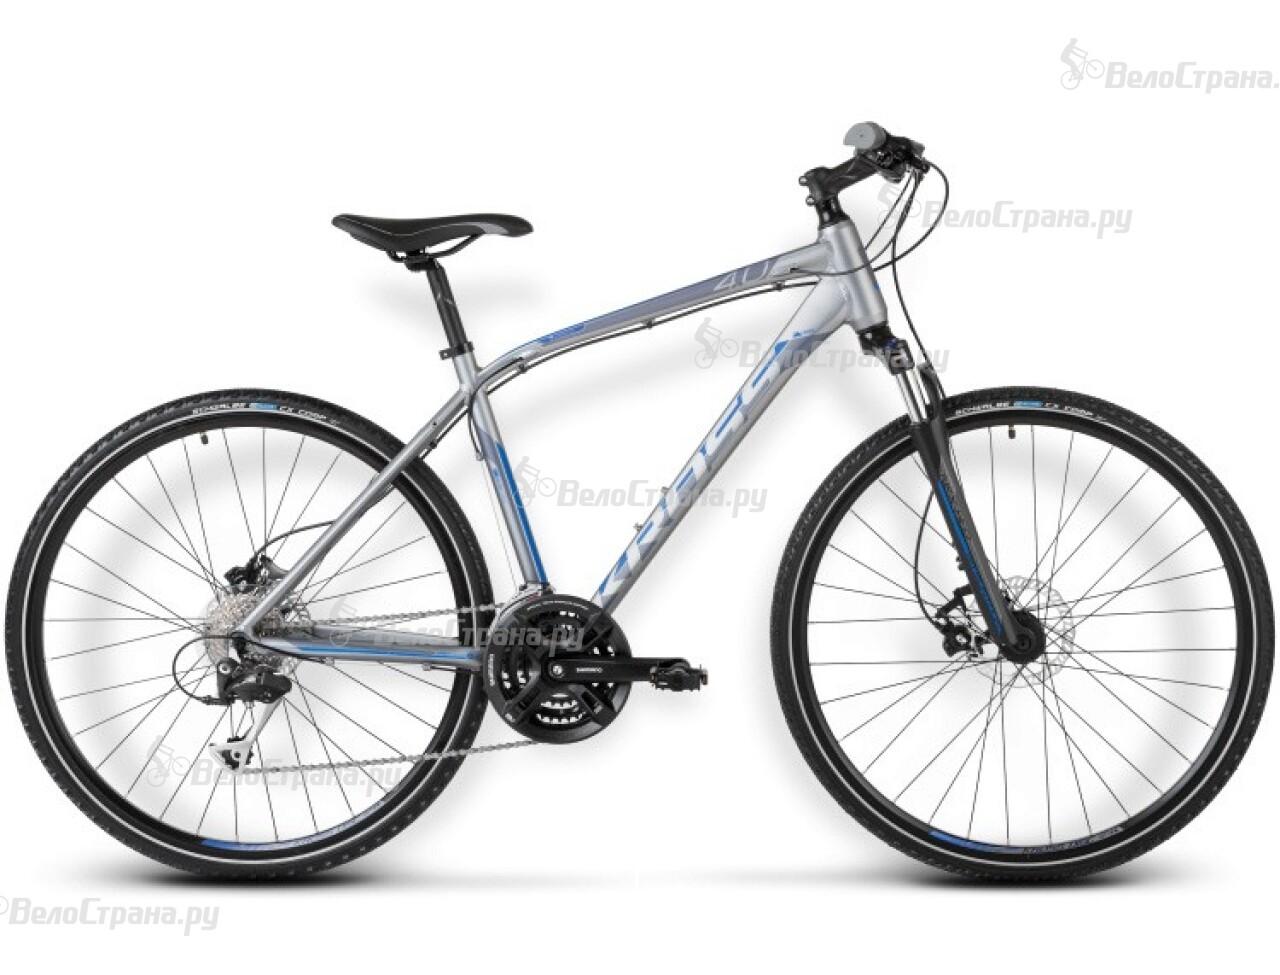 Велосипед Kross EVADO 4.0 (2016) велосипед kross evado 6 0 2016